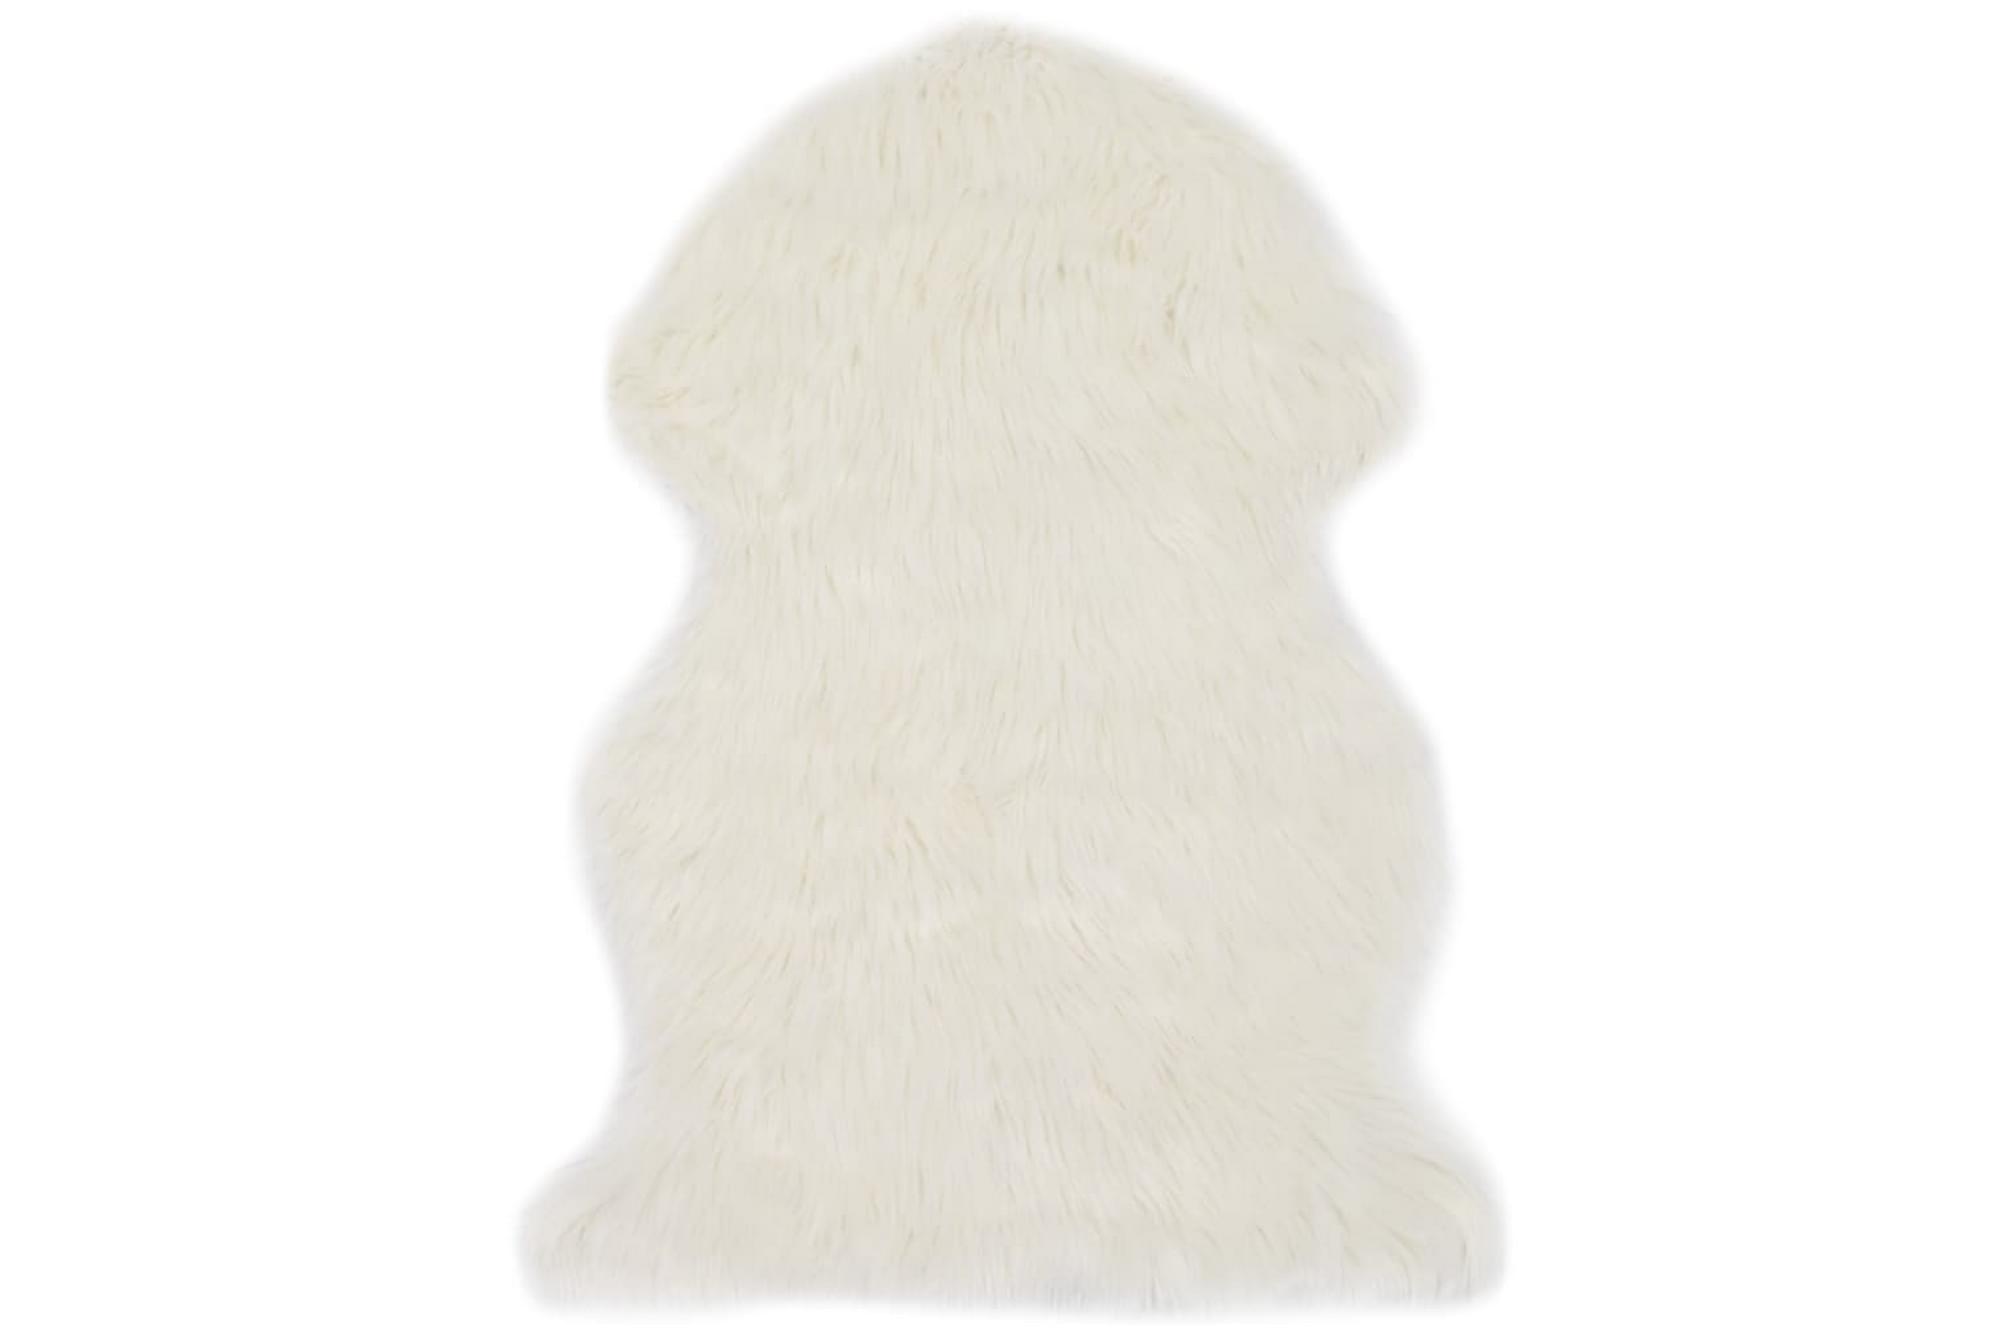 Matta 60×90 cm vit konstgjort fårskinn